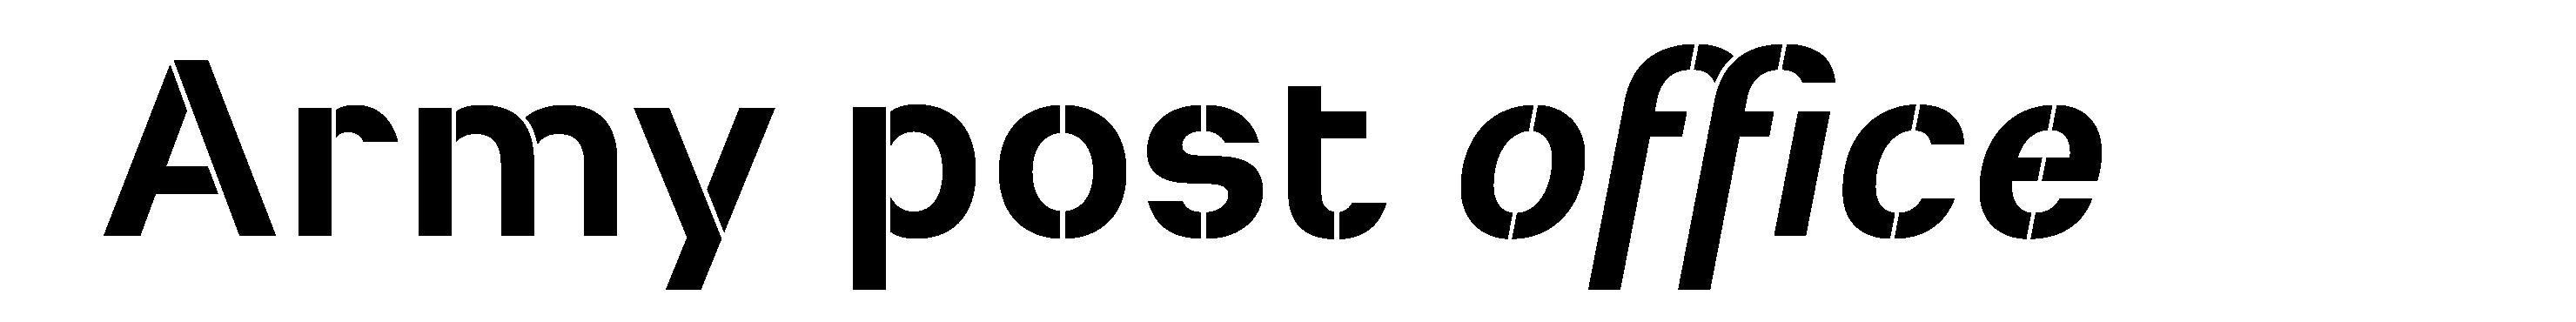 Typeface Heimat Stencil D011 Atlas Font Foundry